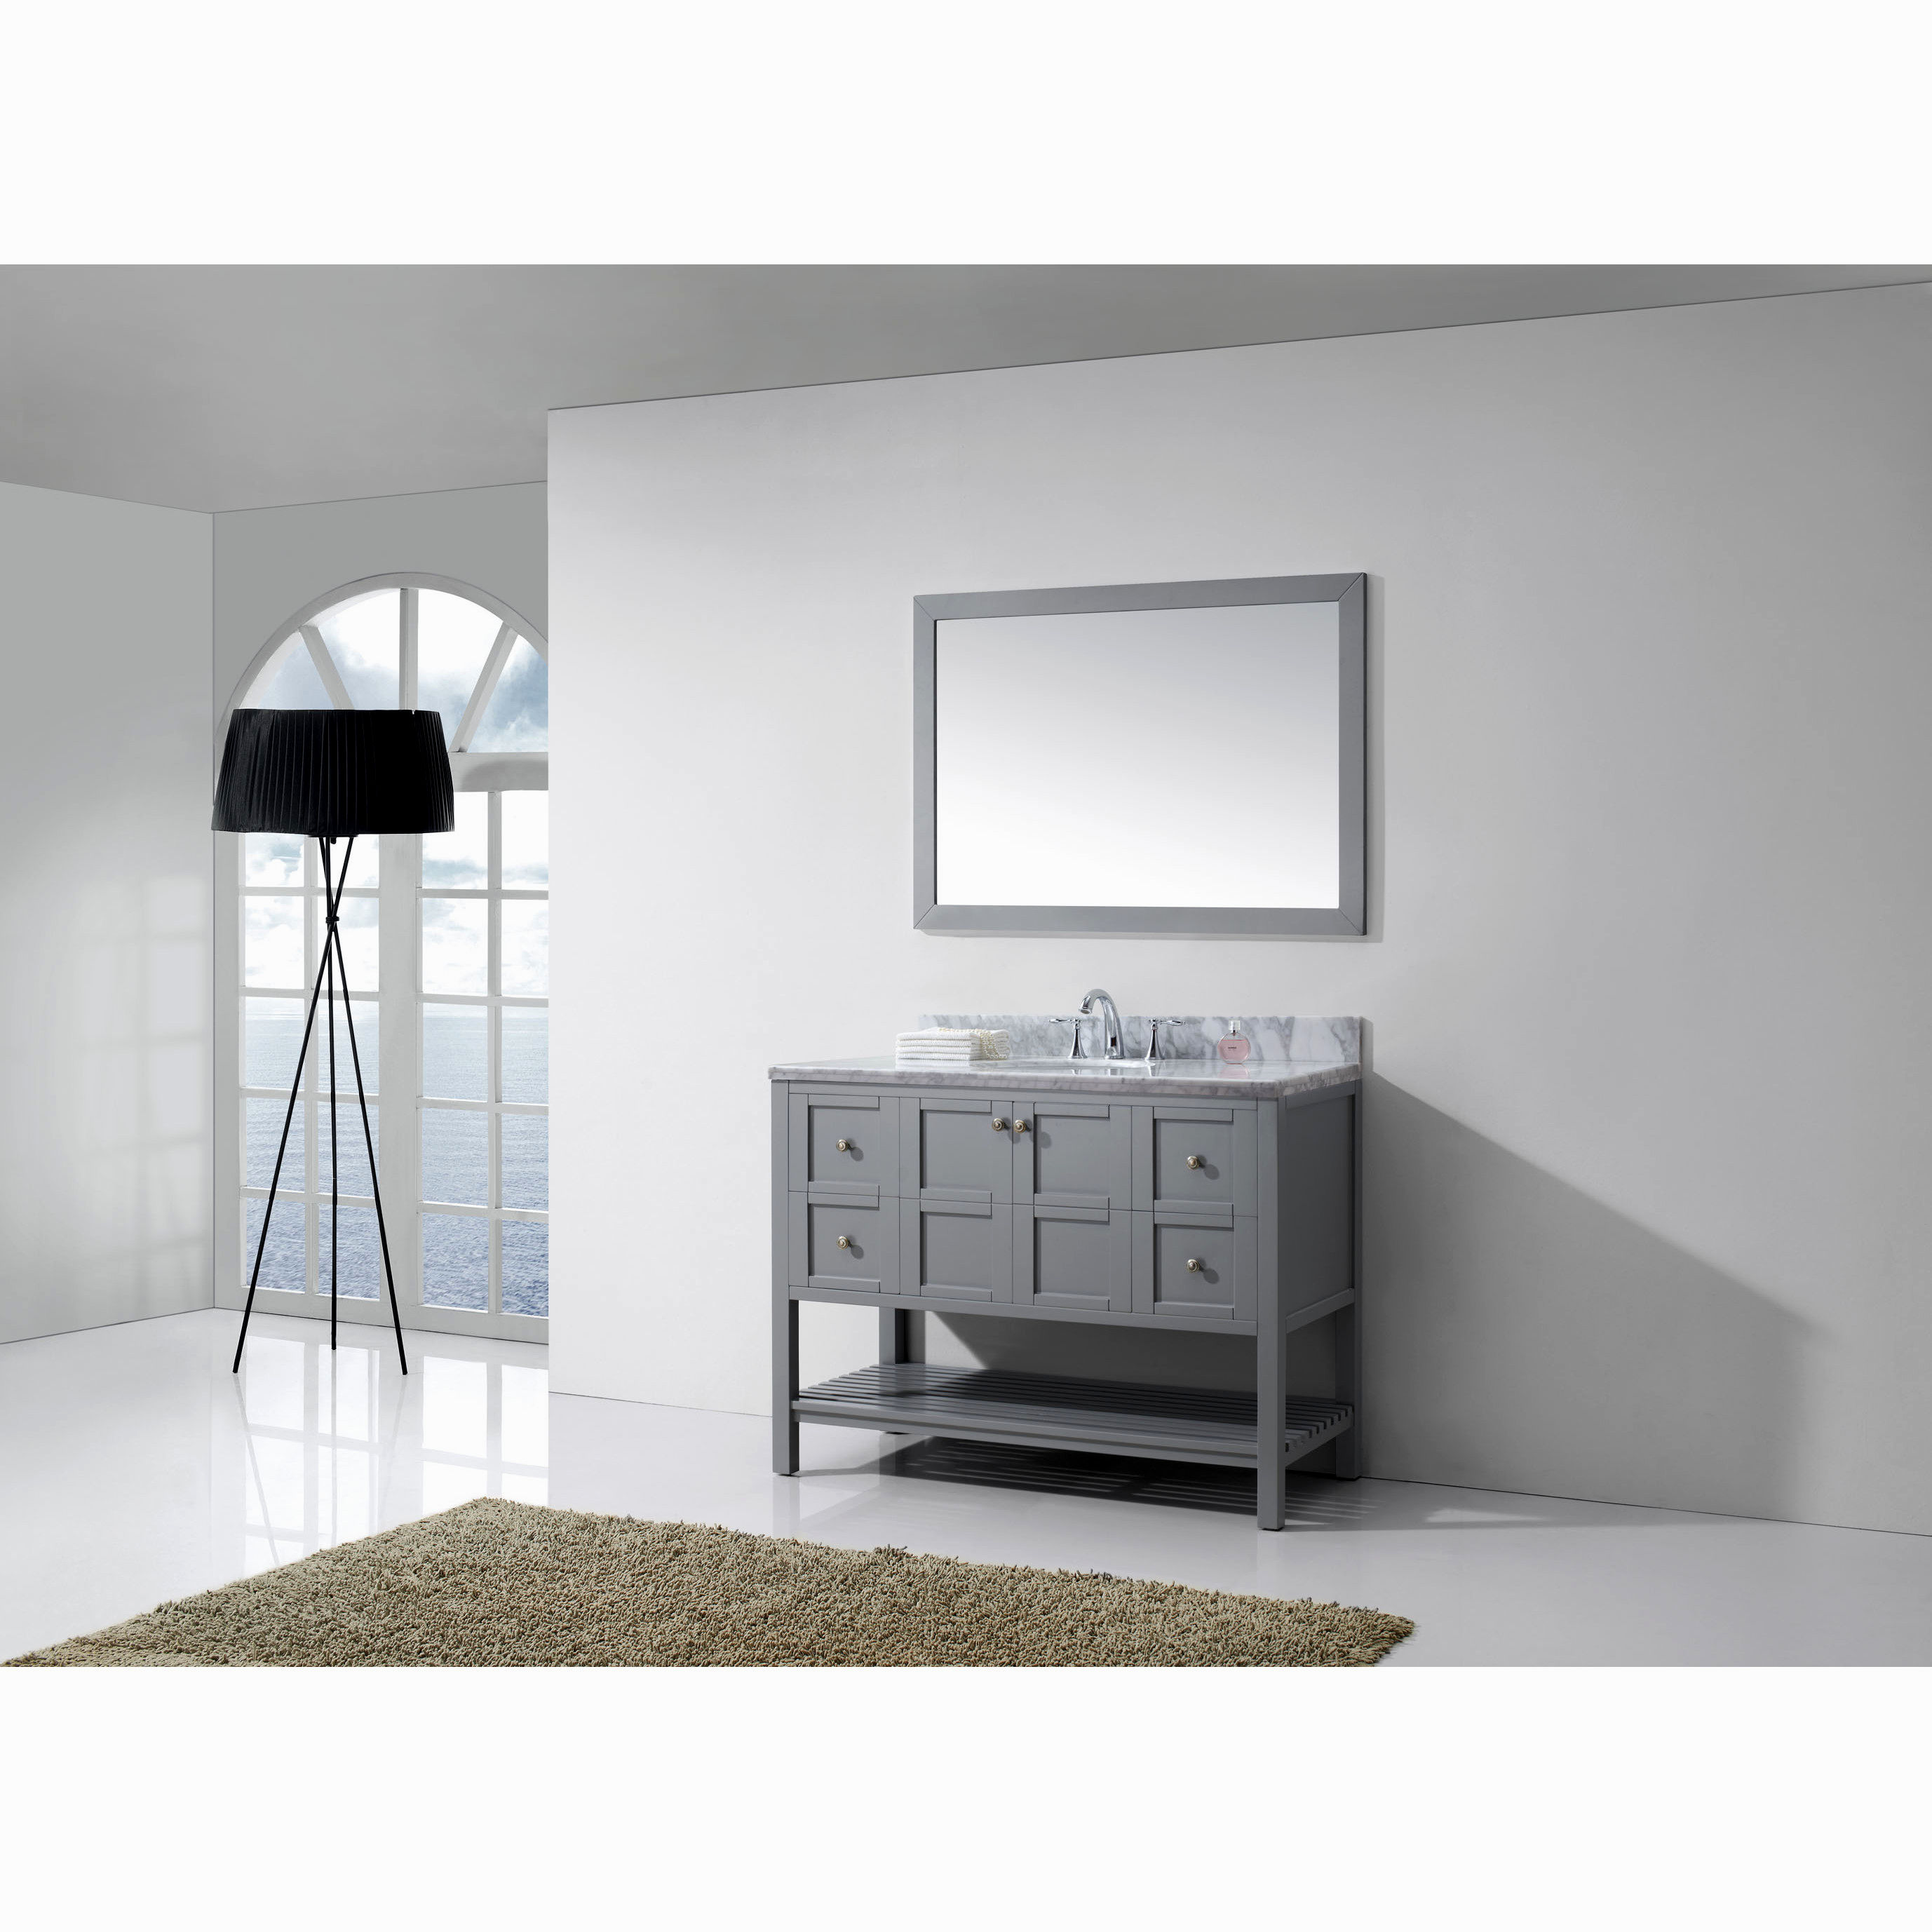 bath home house how menards your sink vanities bathroom x inch vanity create marvelous depot size tops premier for to single large wayfair